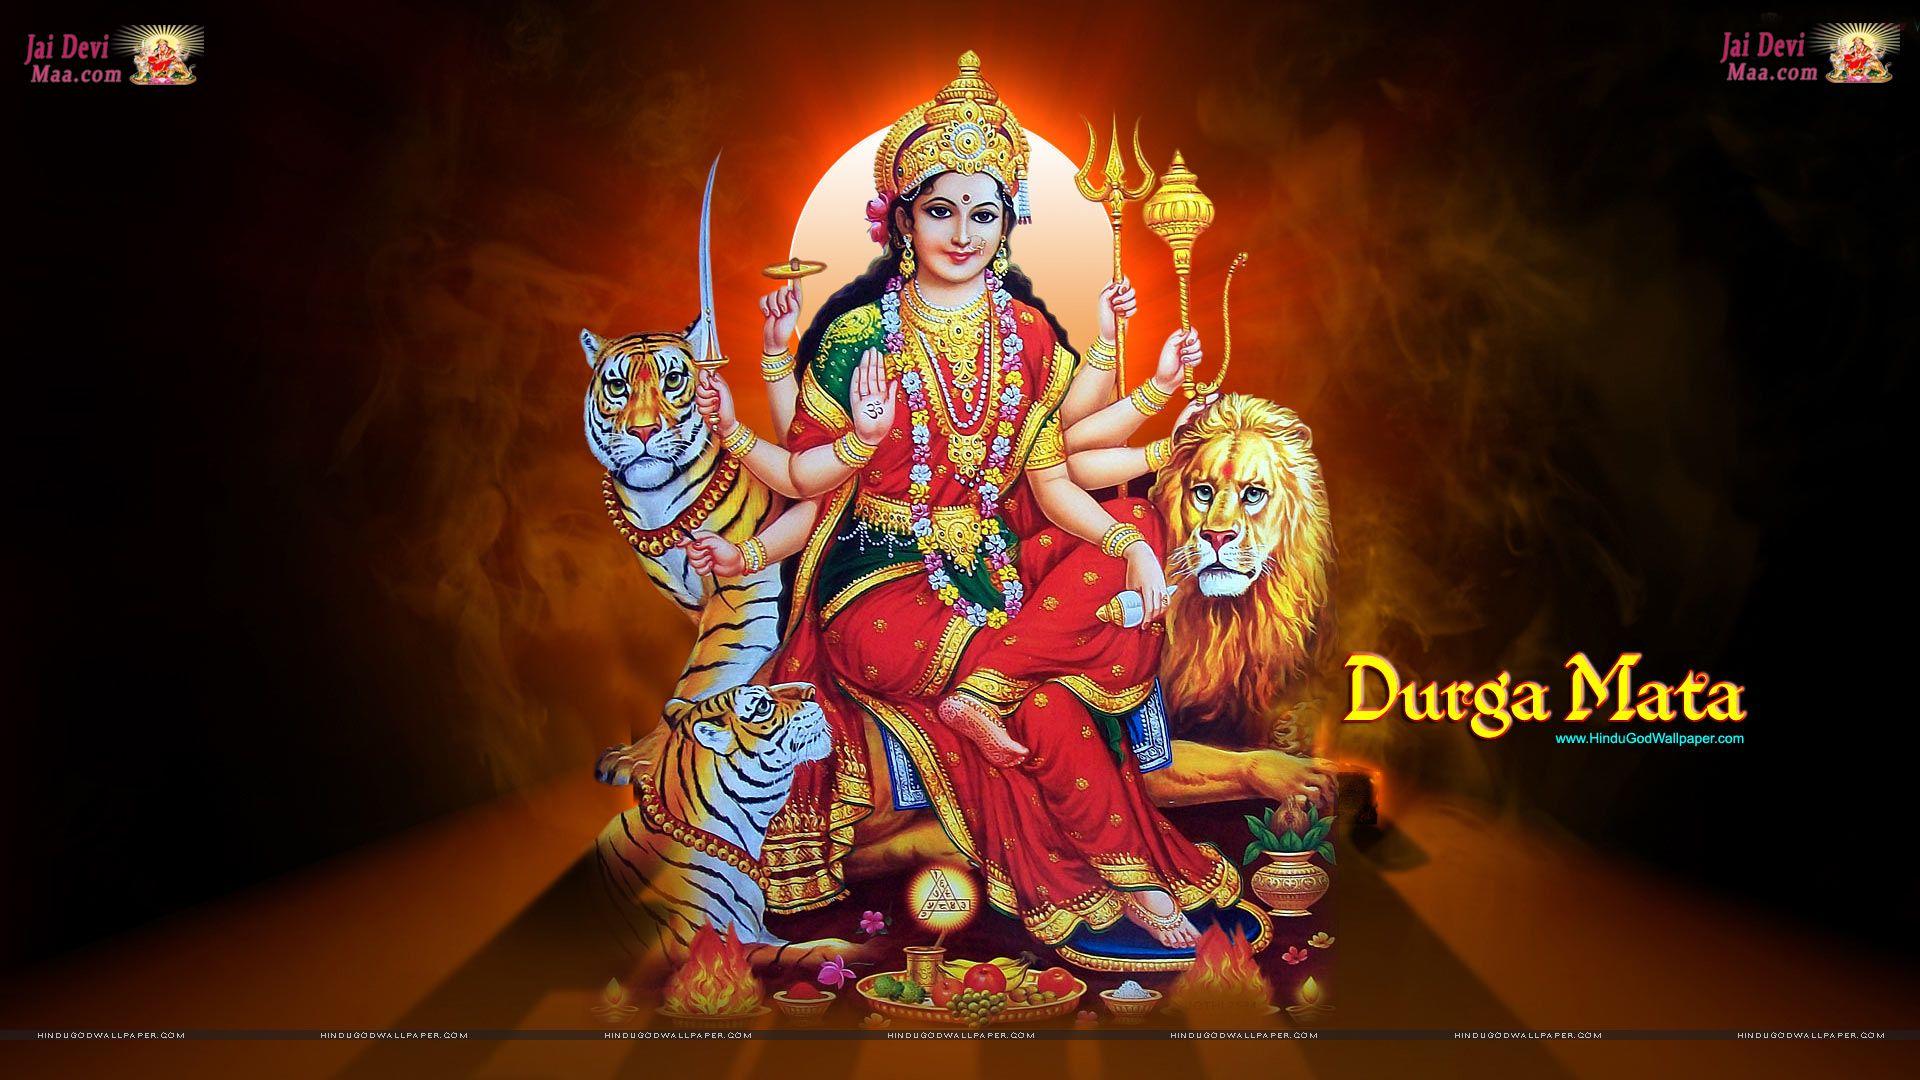 Adorable Maa Durga Hd Wallpapers Images And Pictures Free Download Maa Durga Hd Wallpaper Hd Wallpapers 1080p Durga